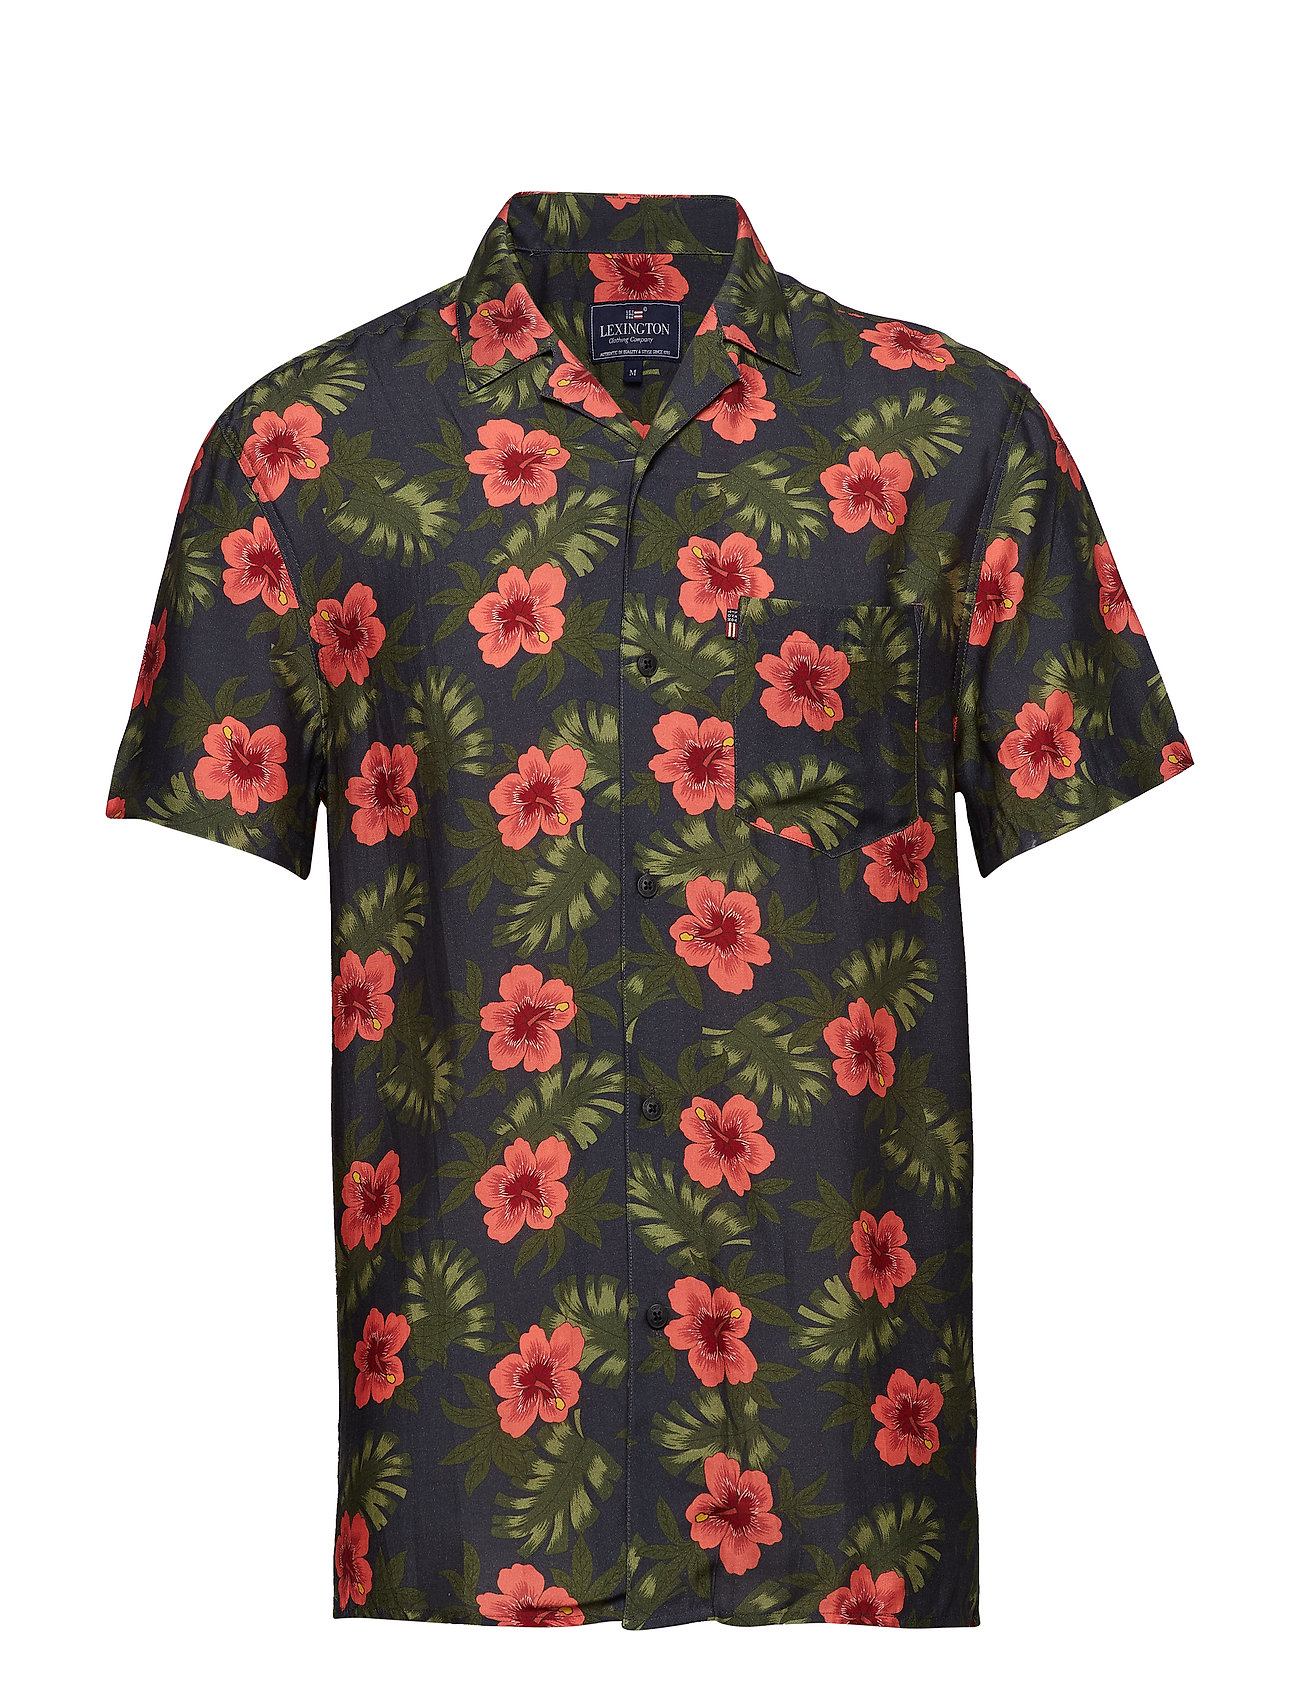 Lexington Clothing Pablo Cuba Shirt - TROPICAL PRINT